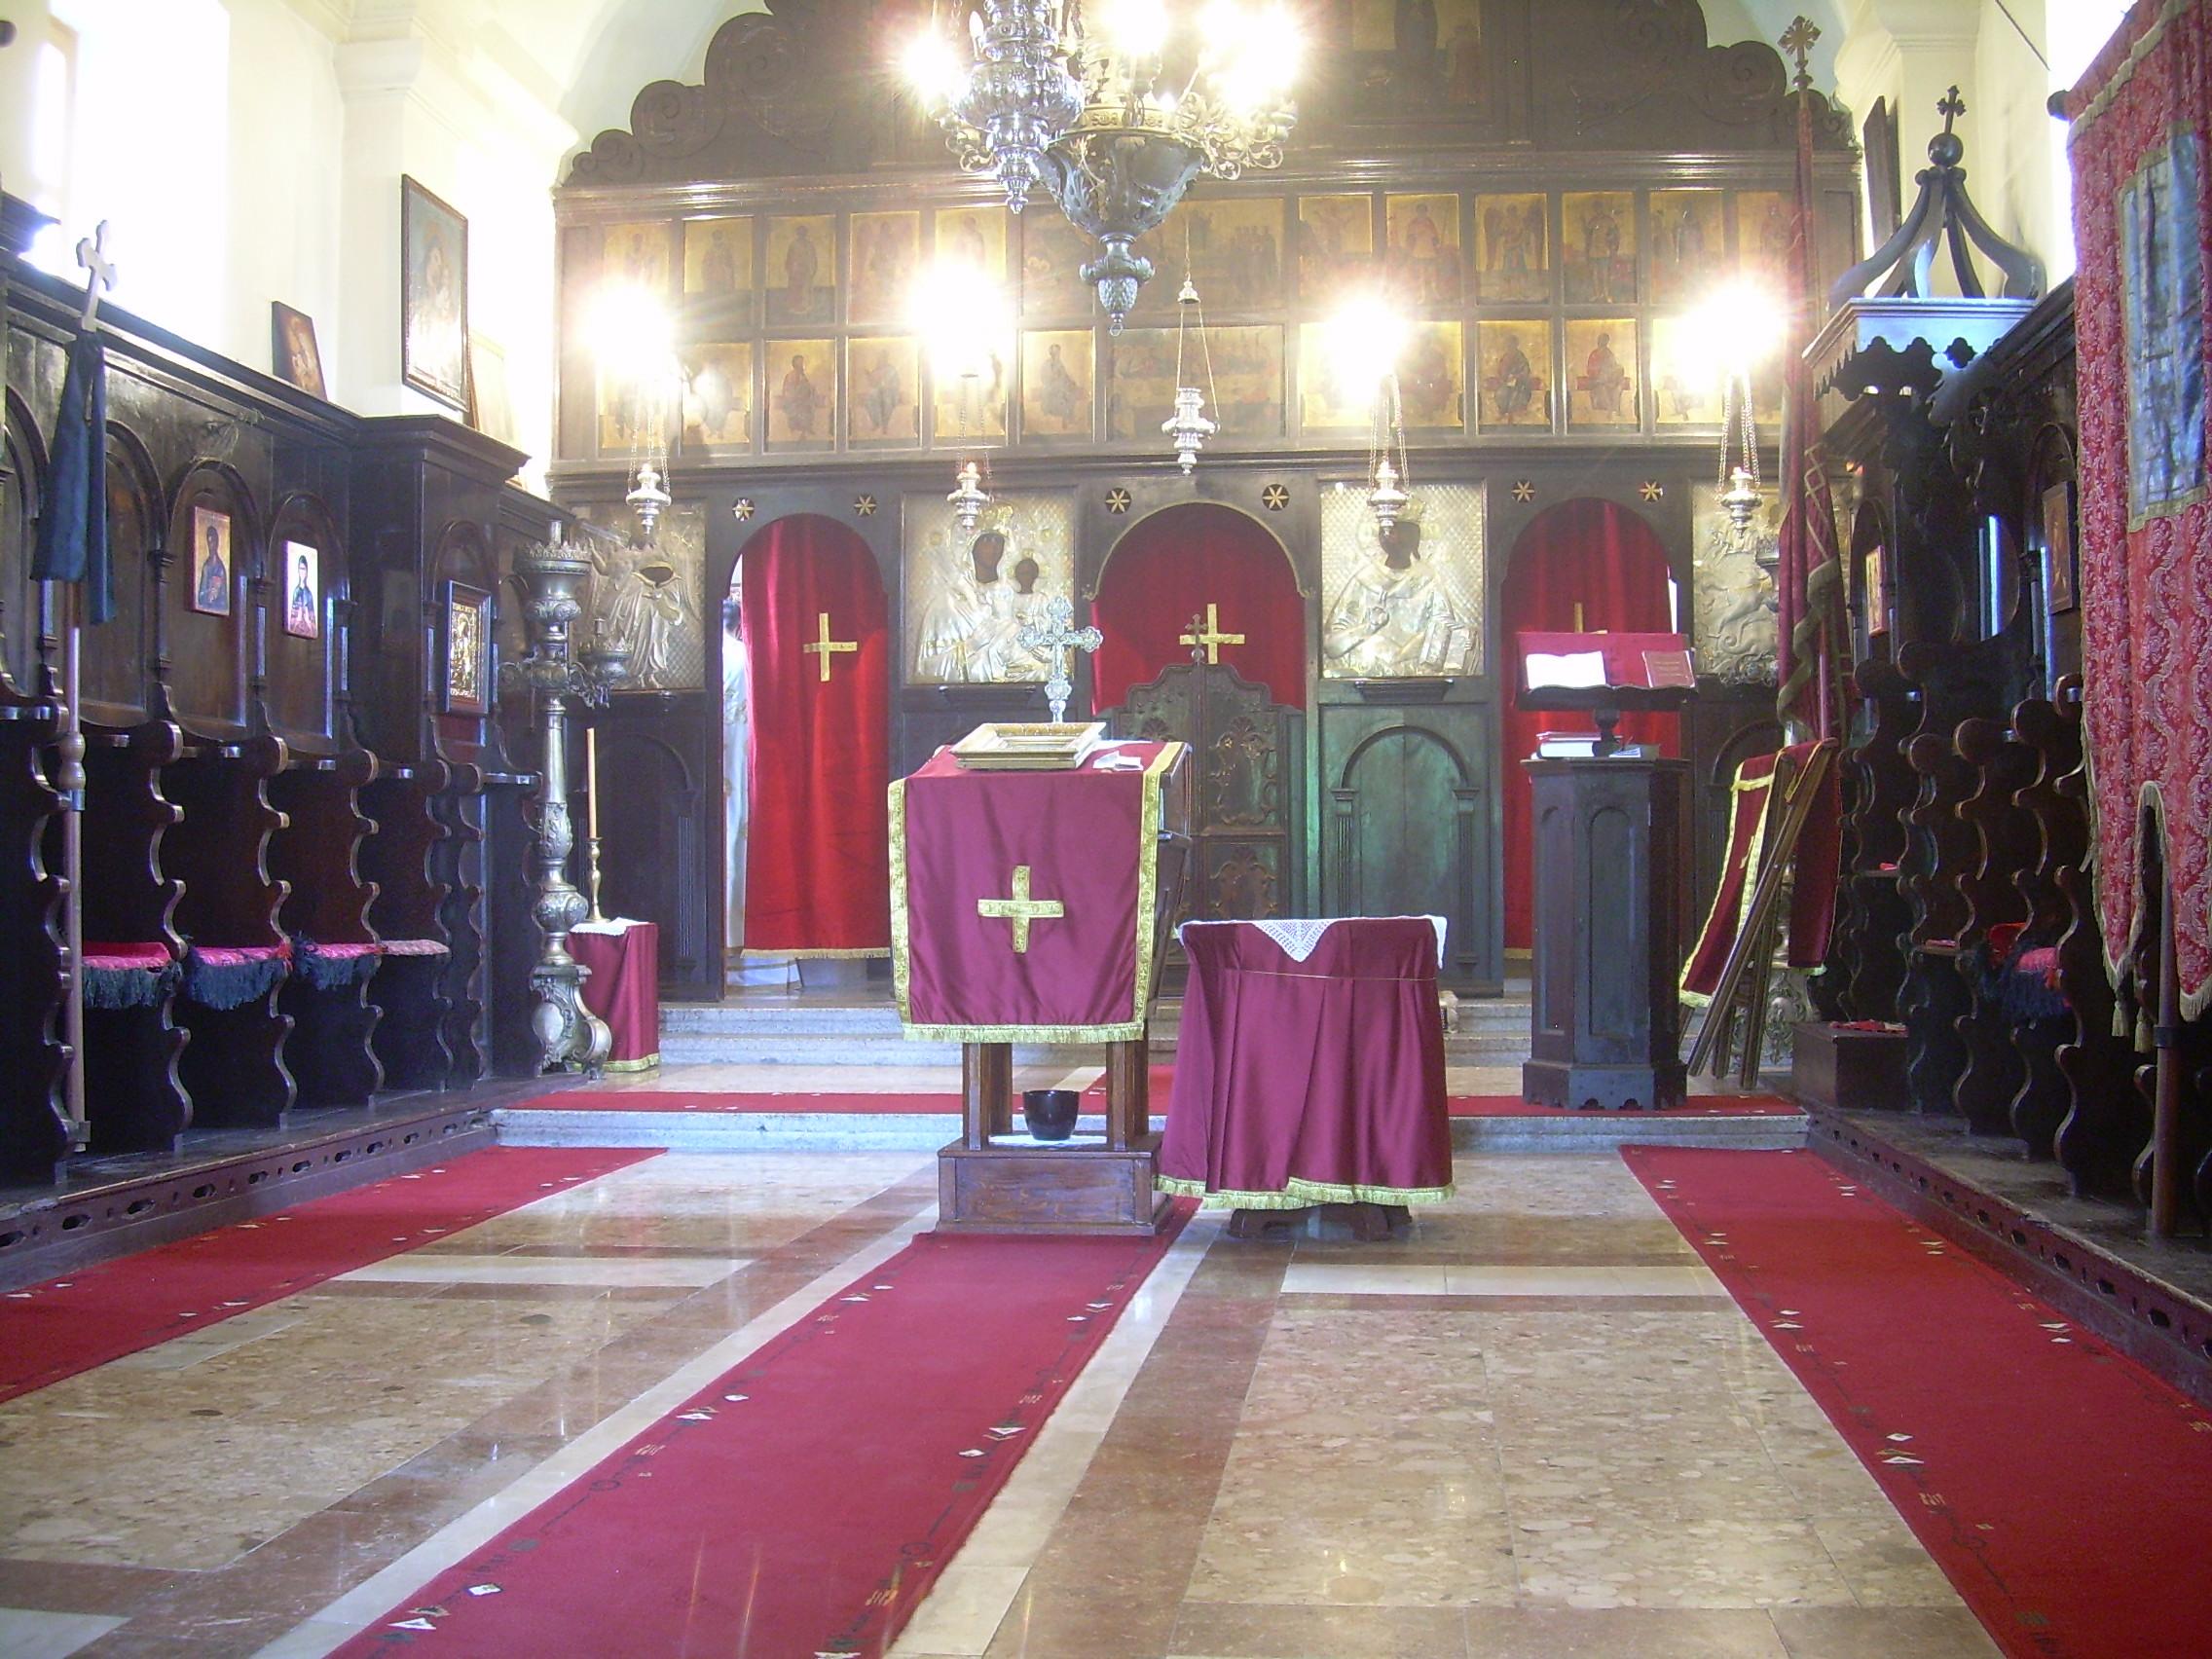 Унутрашњост цркве, иконостас.